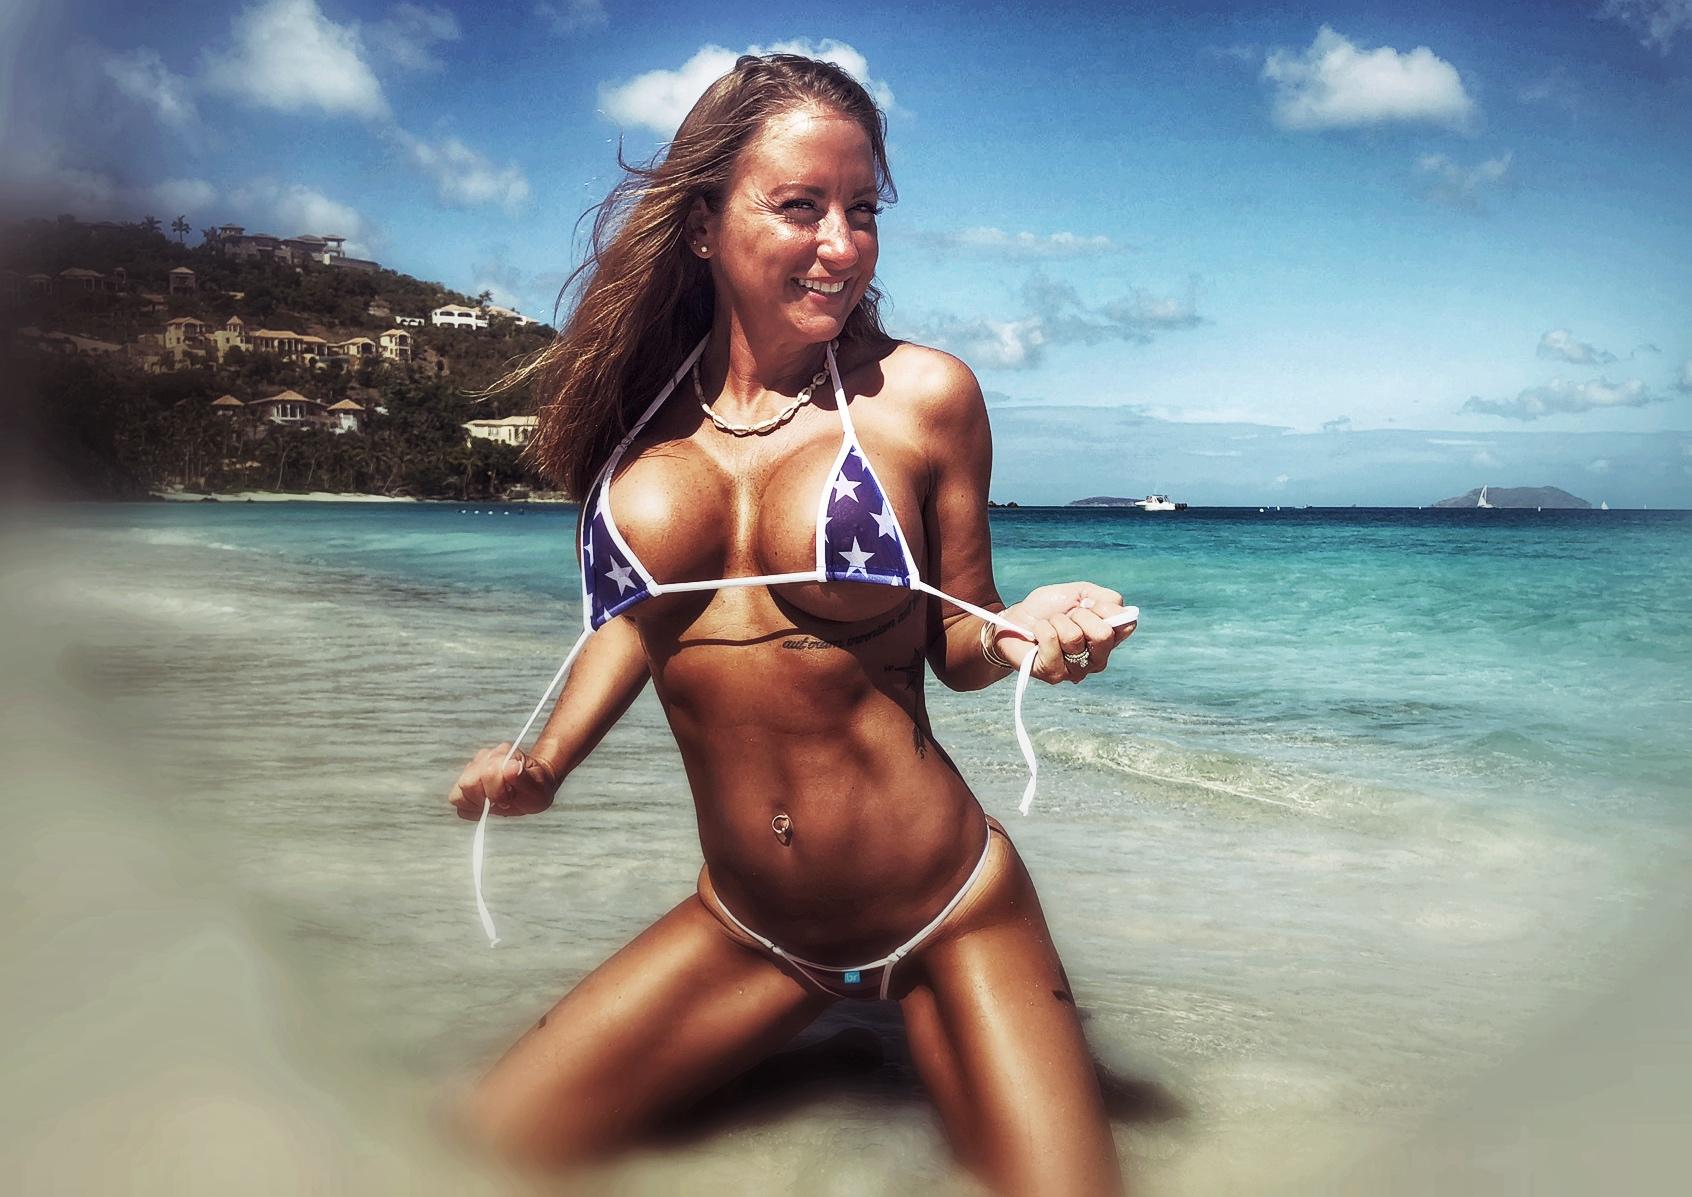 sherri gulley bikini model st john usvi